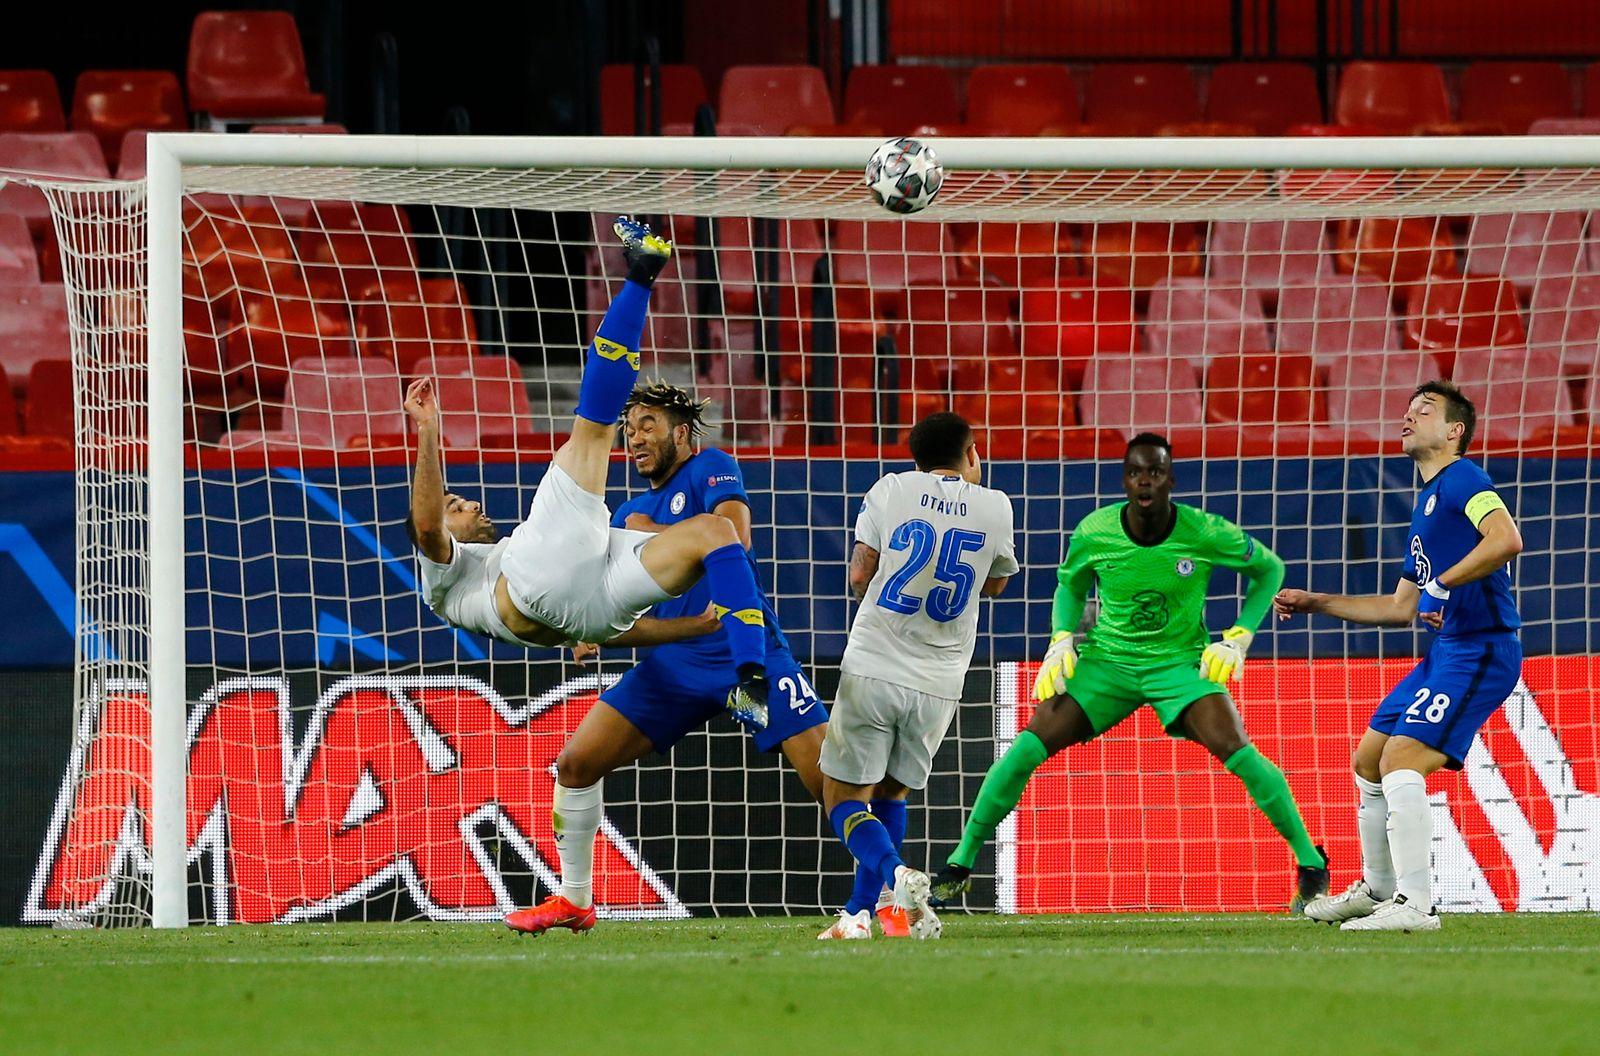 Champions League - Quarter Final Second Leg - Chelsea v Porto